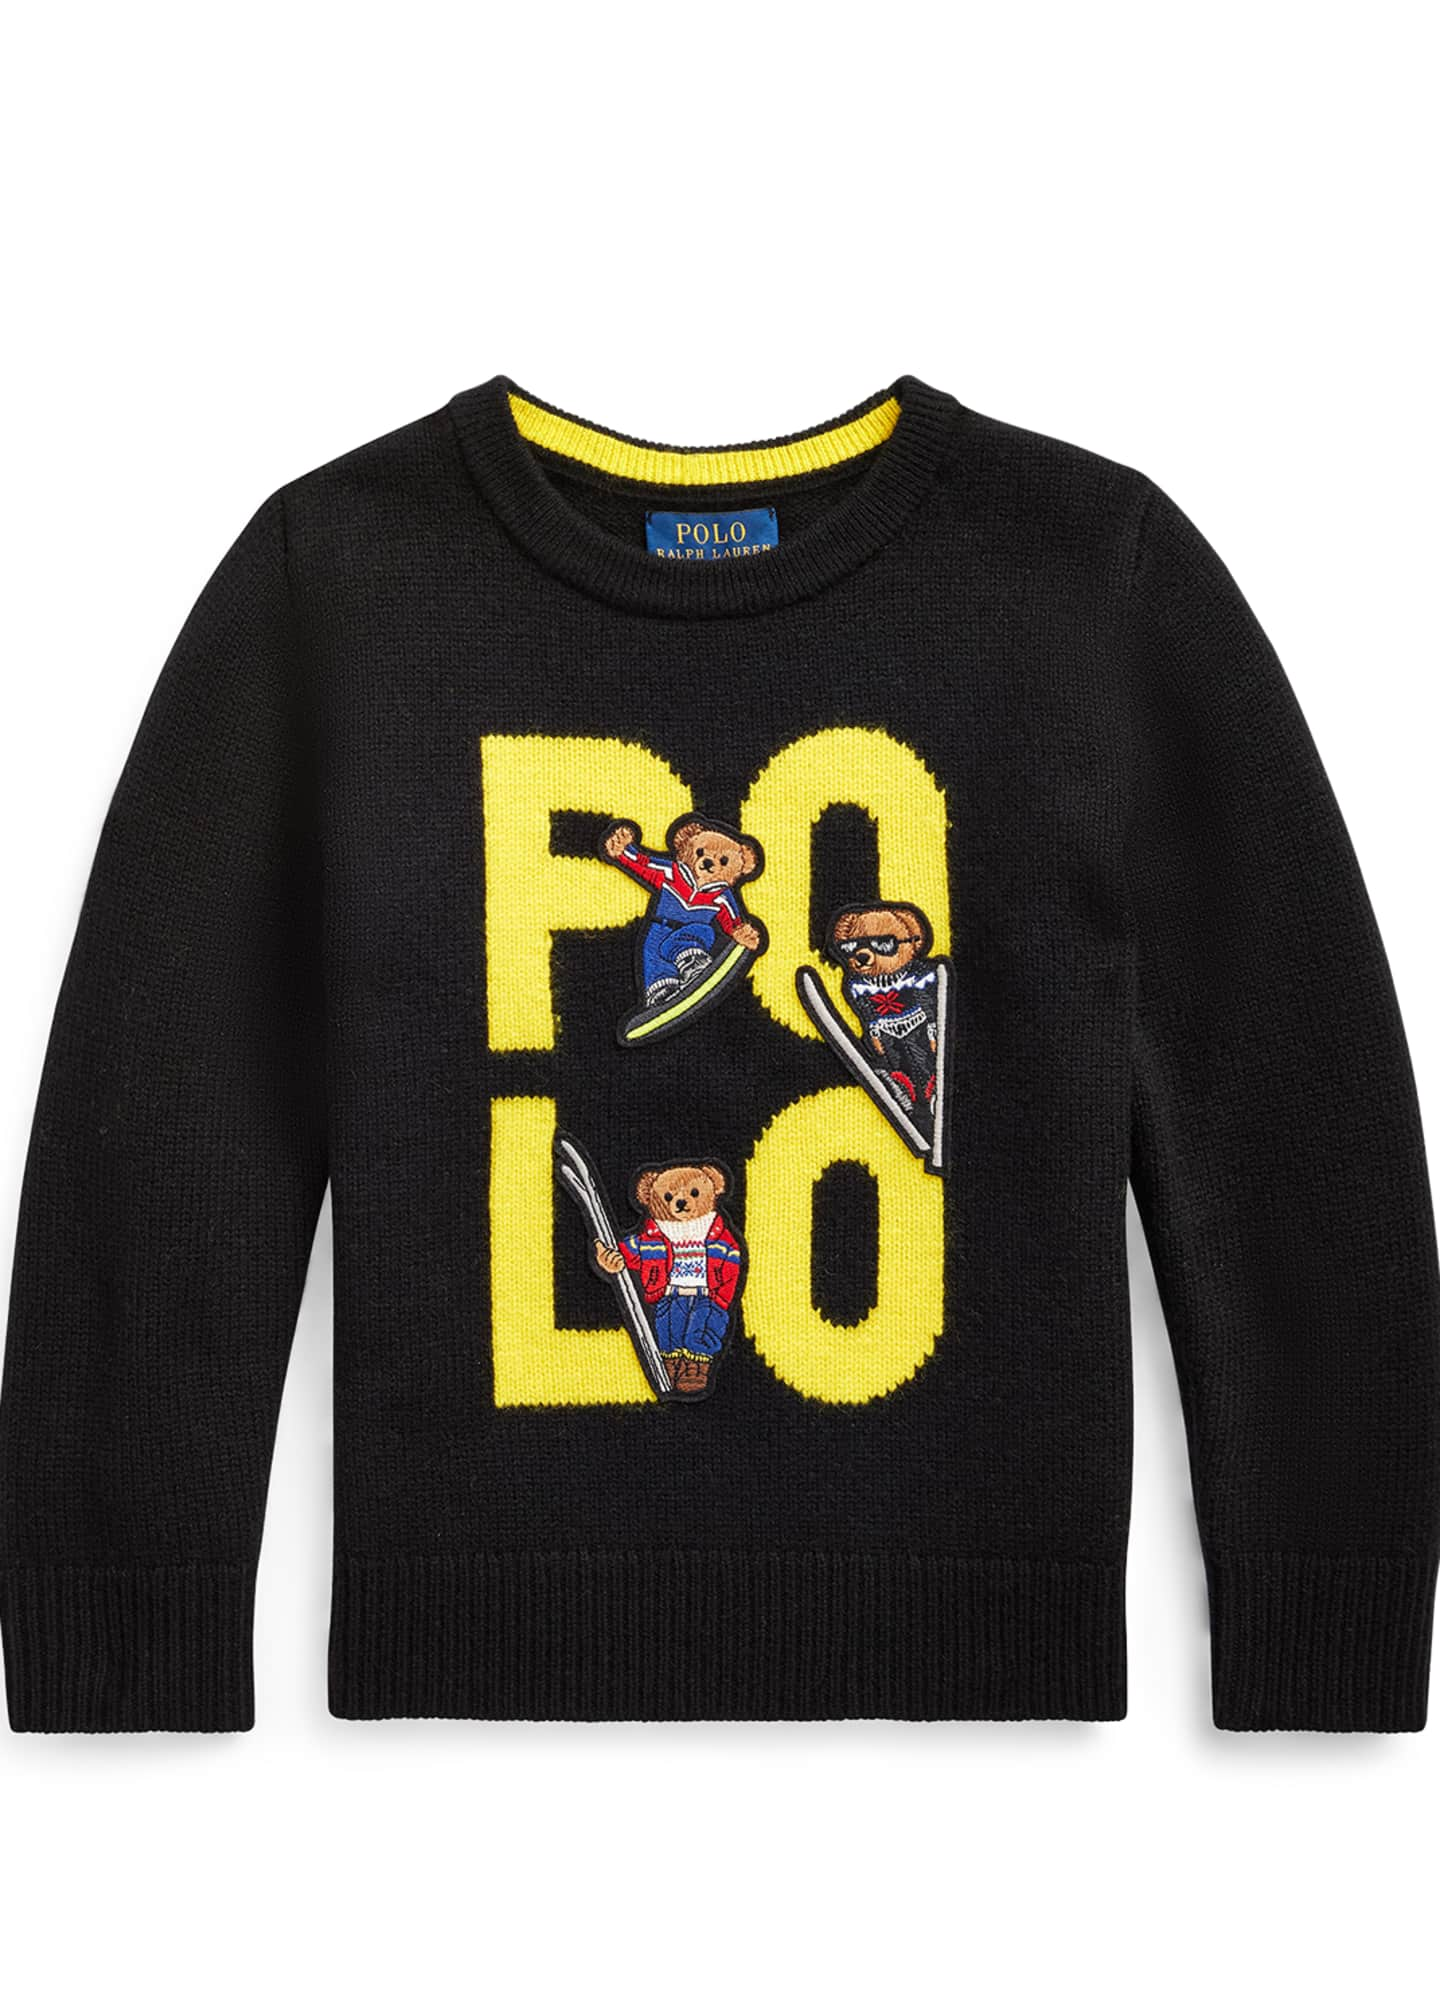 Ralph Lauren Childrenswear Boy's Merino Wool Logo Sweater,